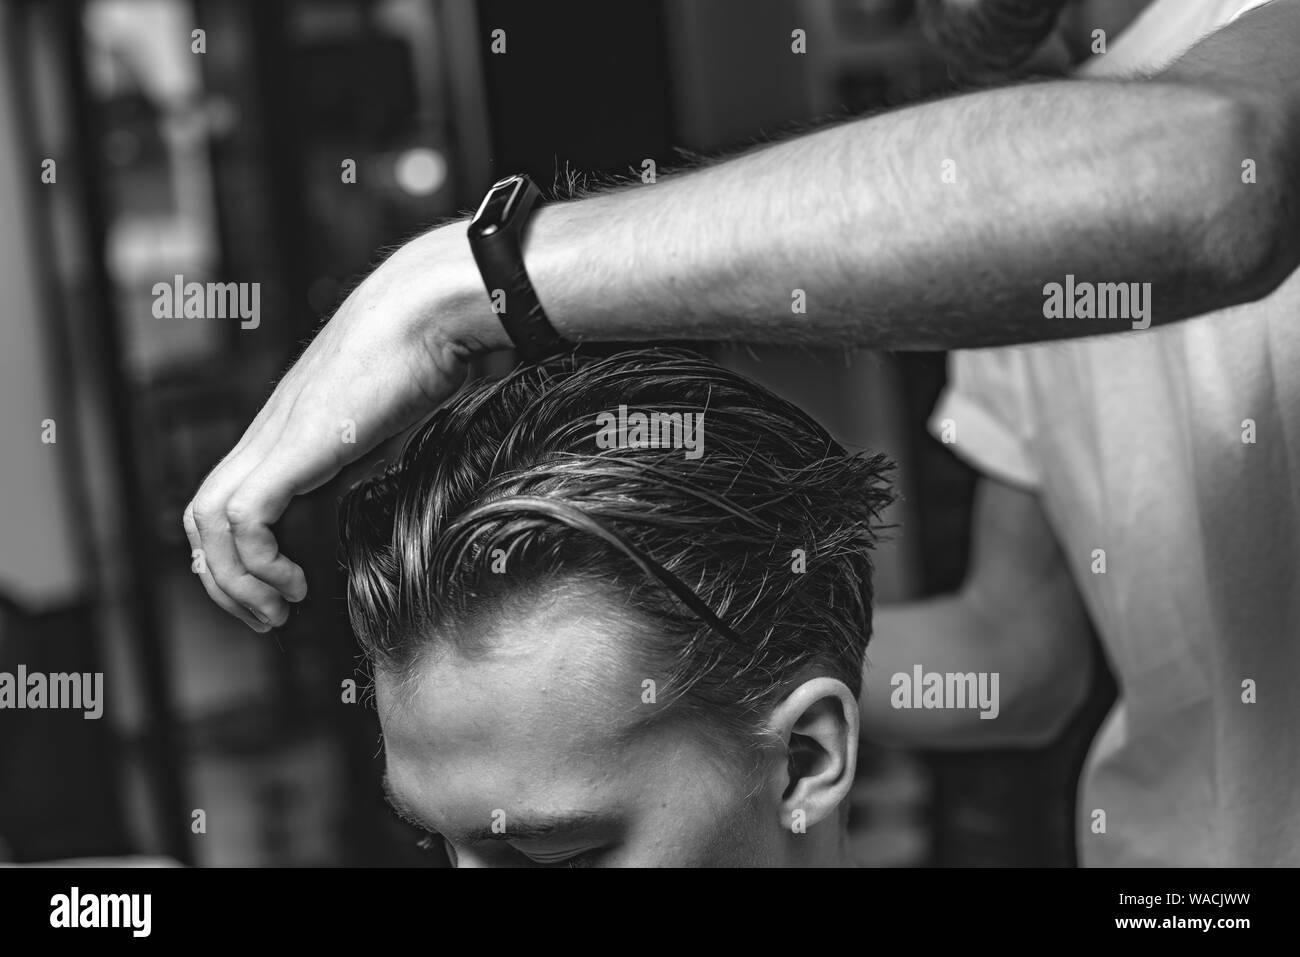 Hair Salon Black And White Stock Photos Images Alamy